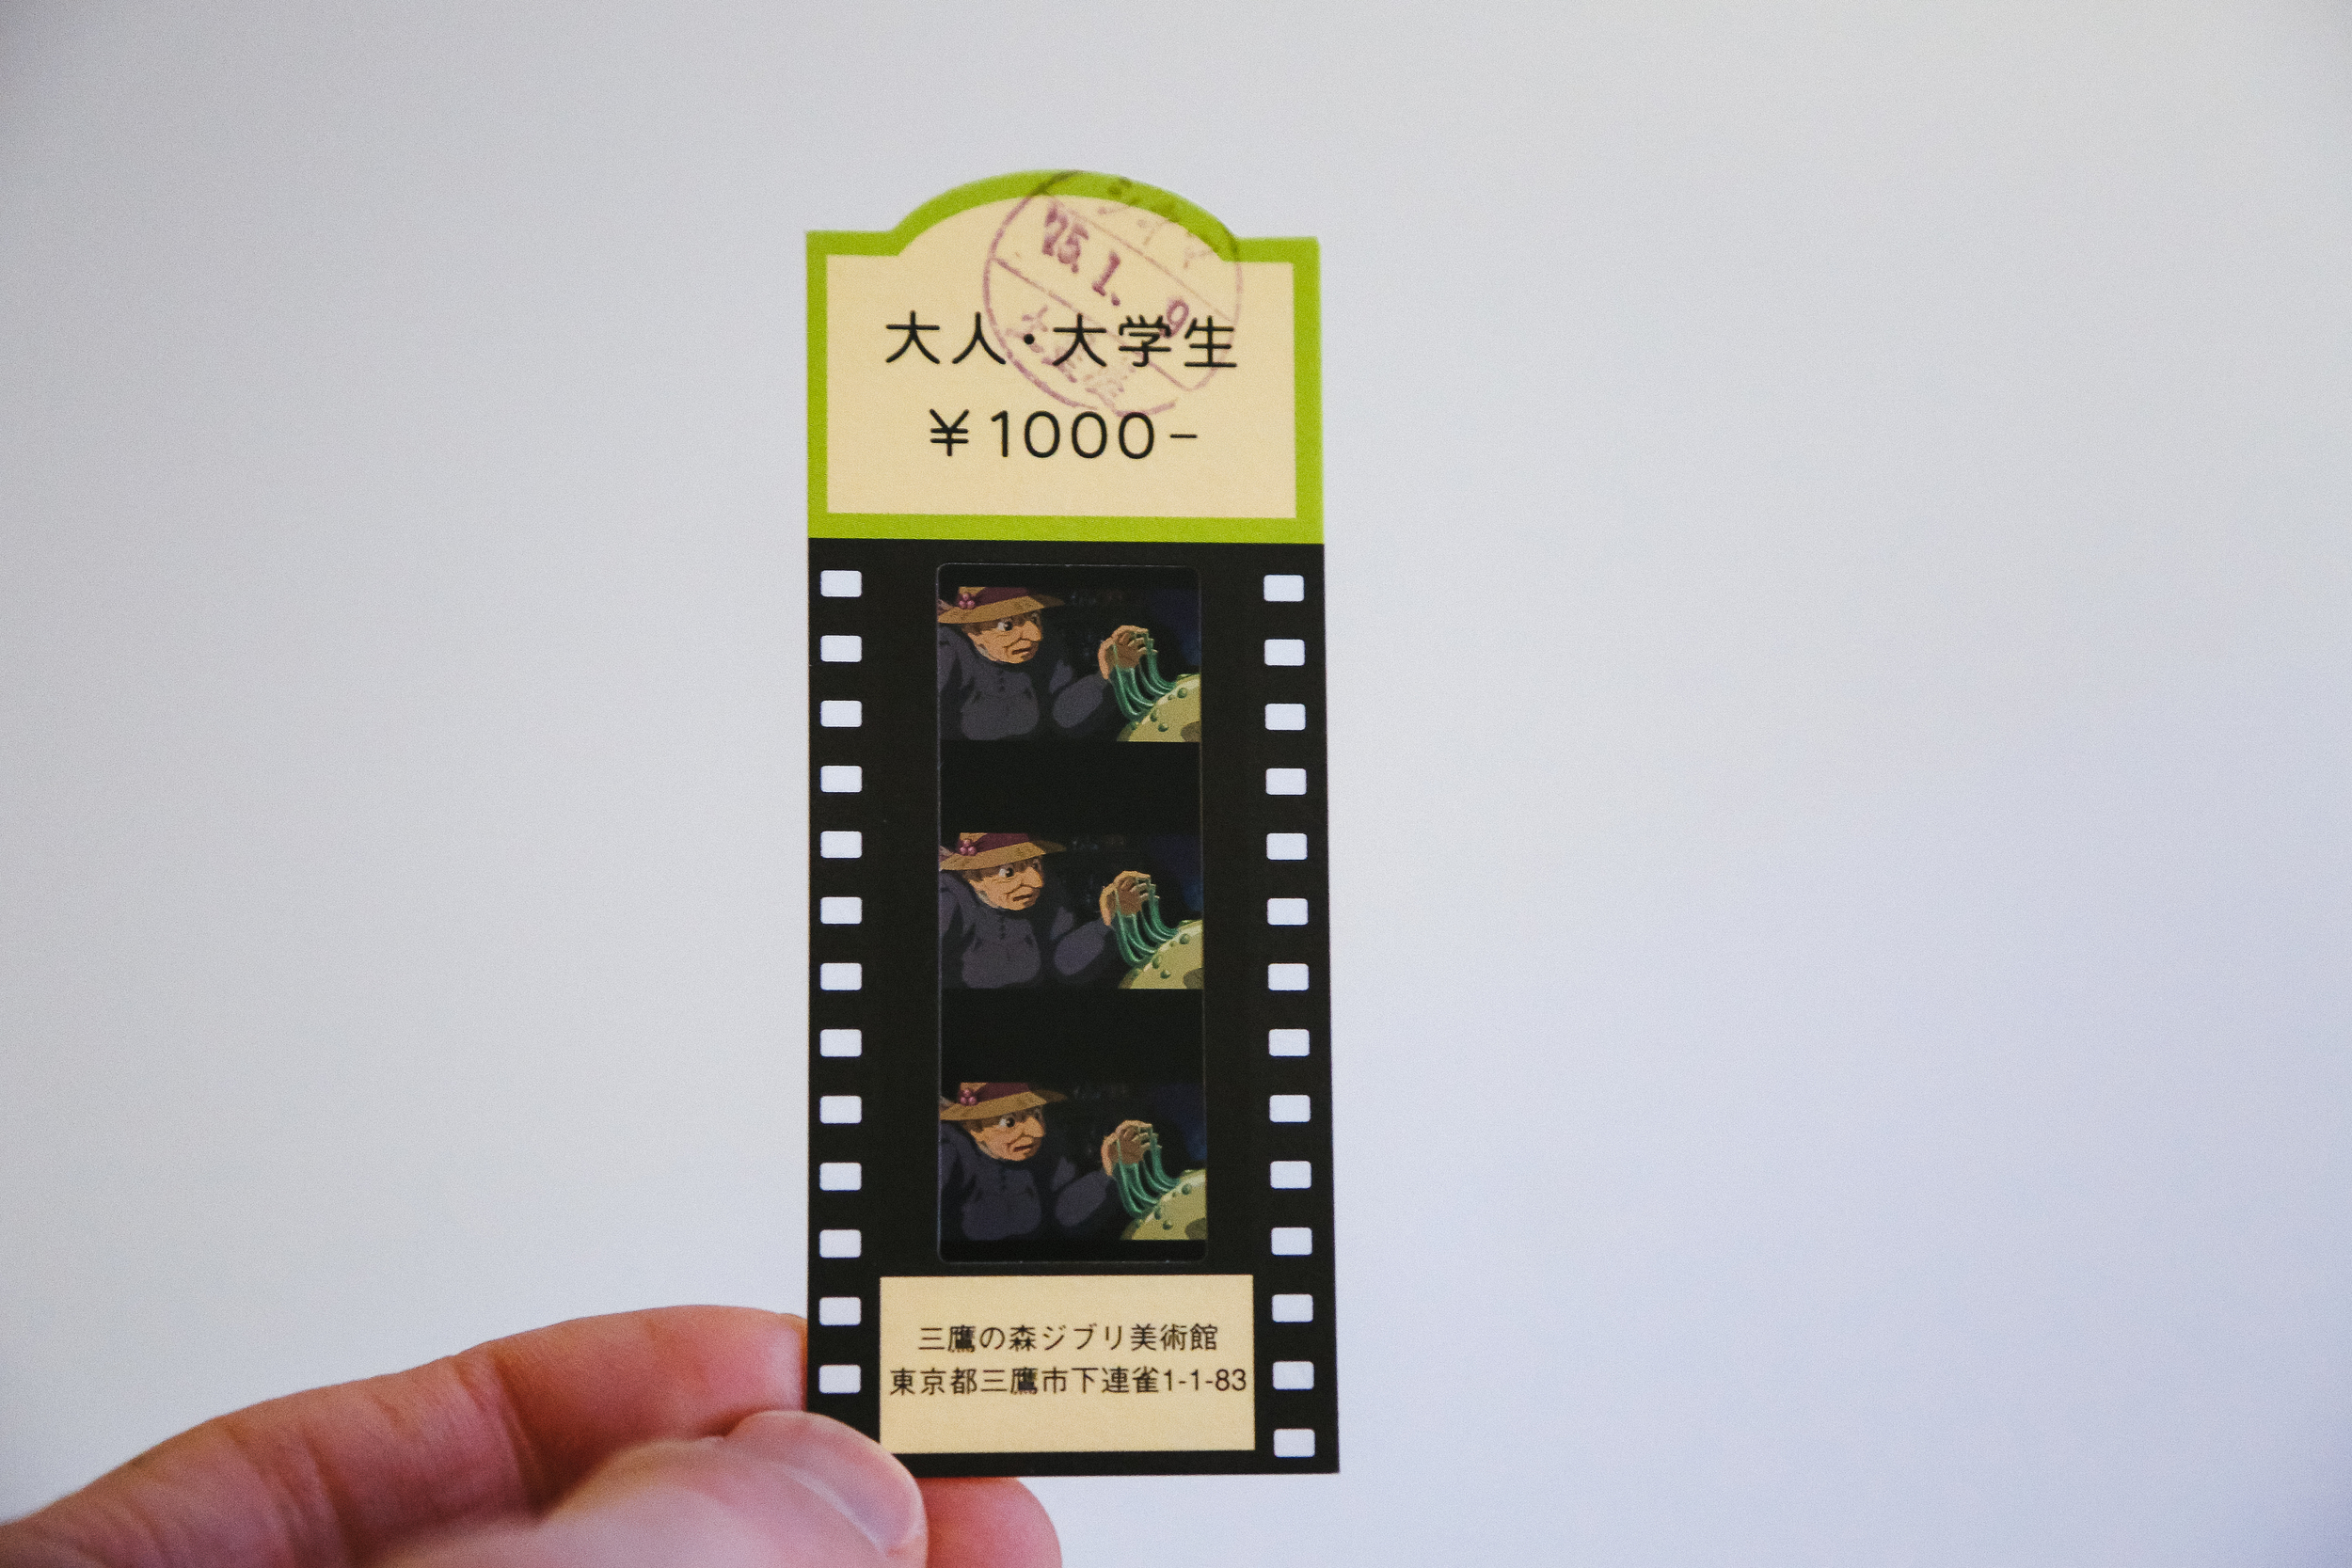 Studio Ghibli Museum Ticket - Eric Bravo Photography